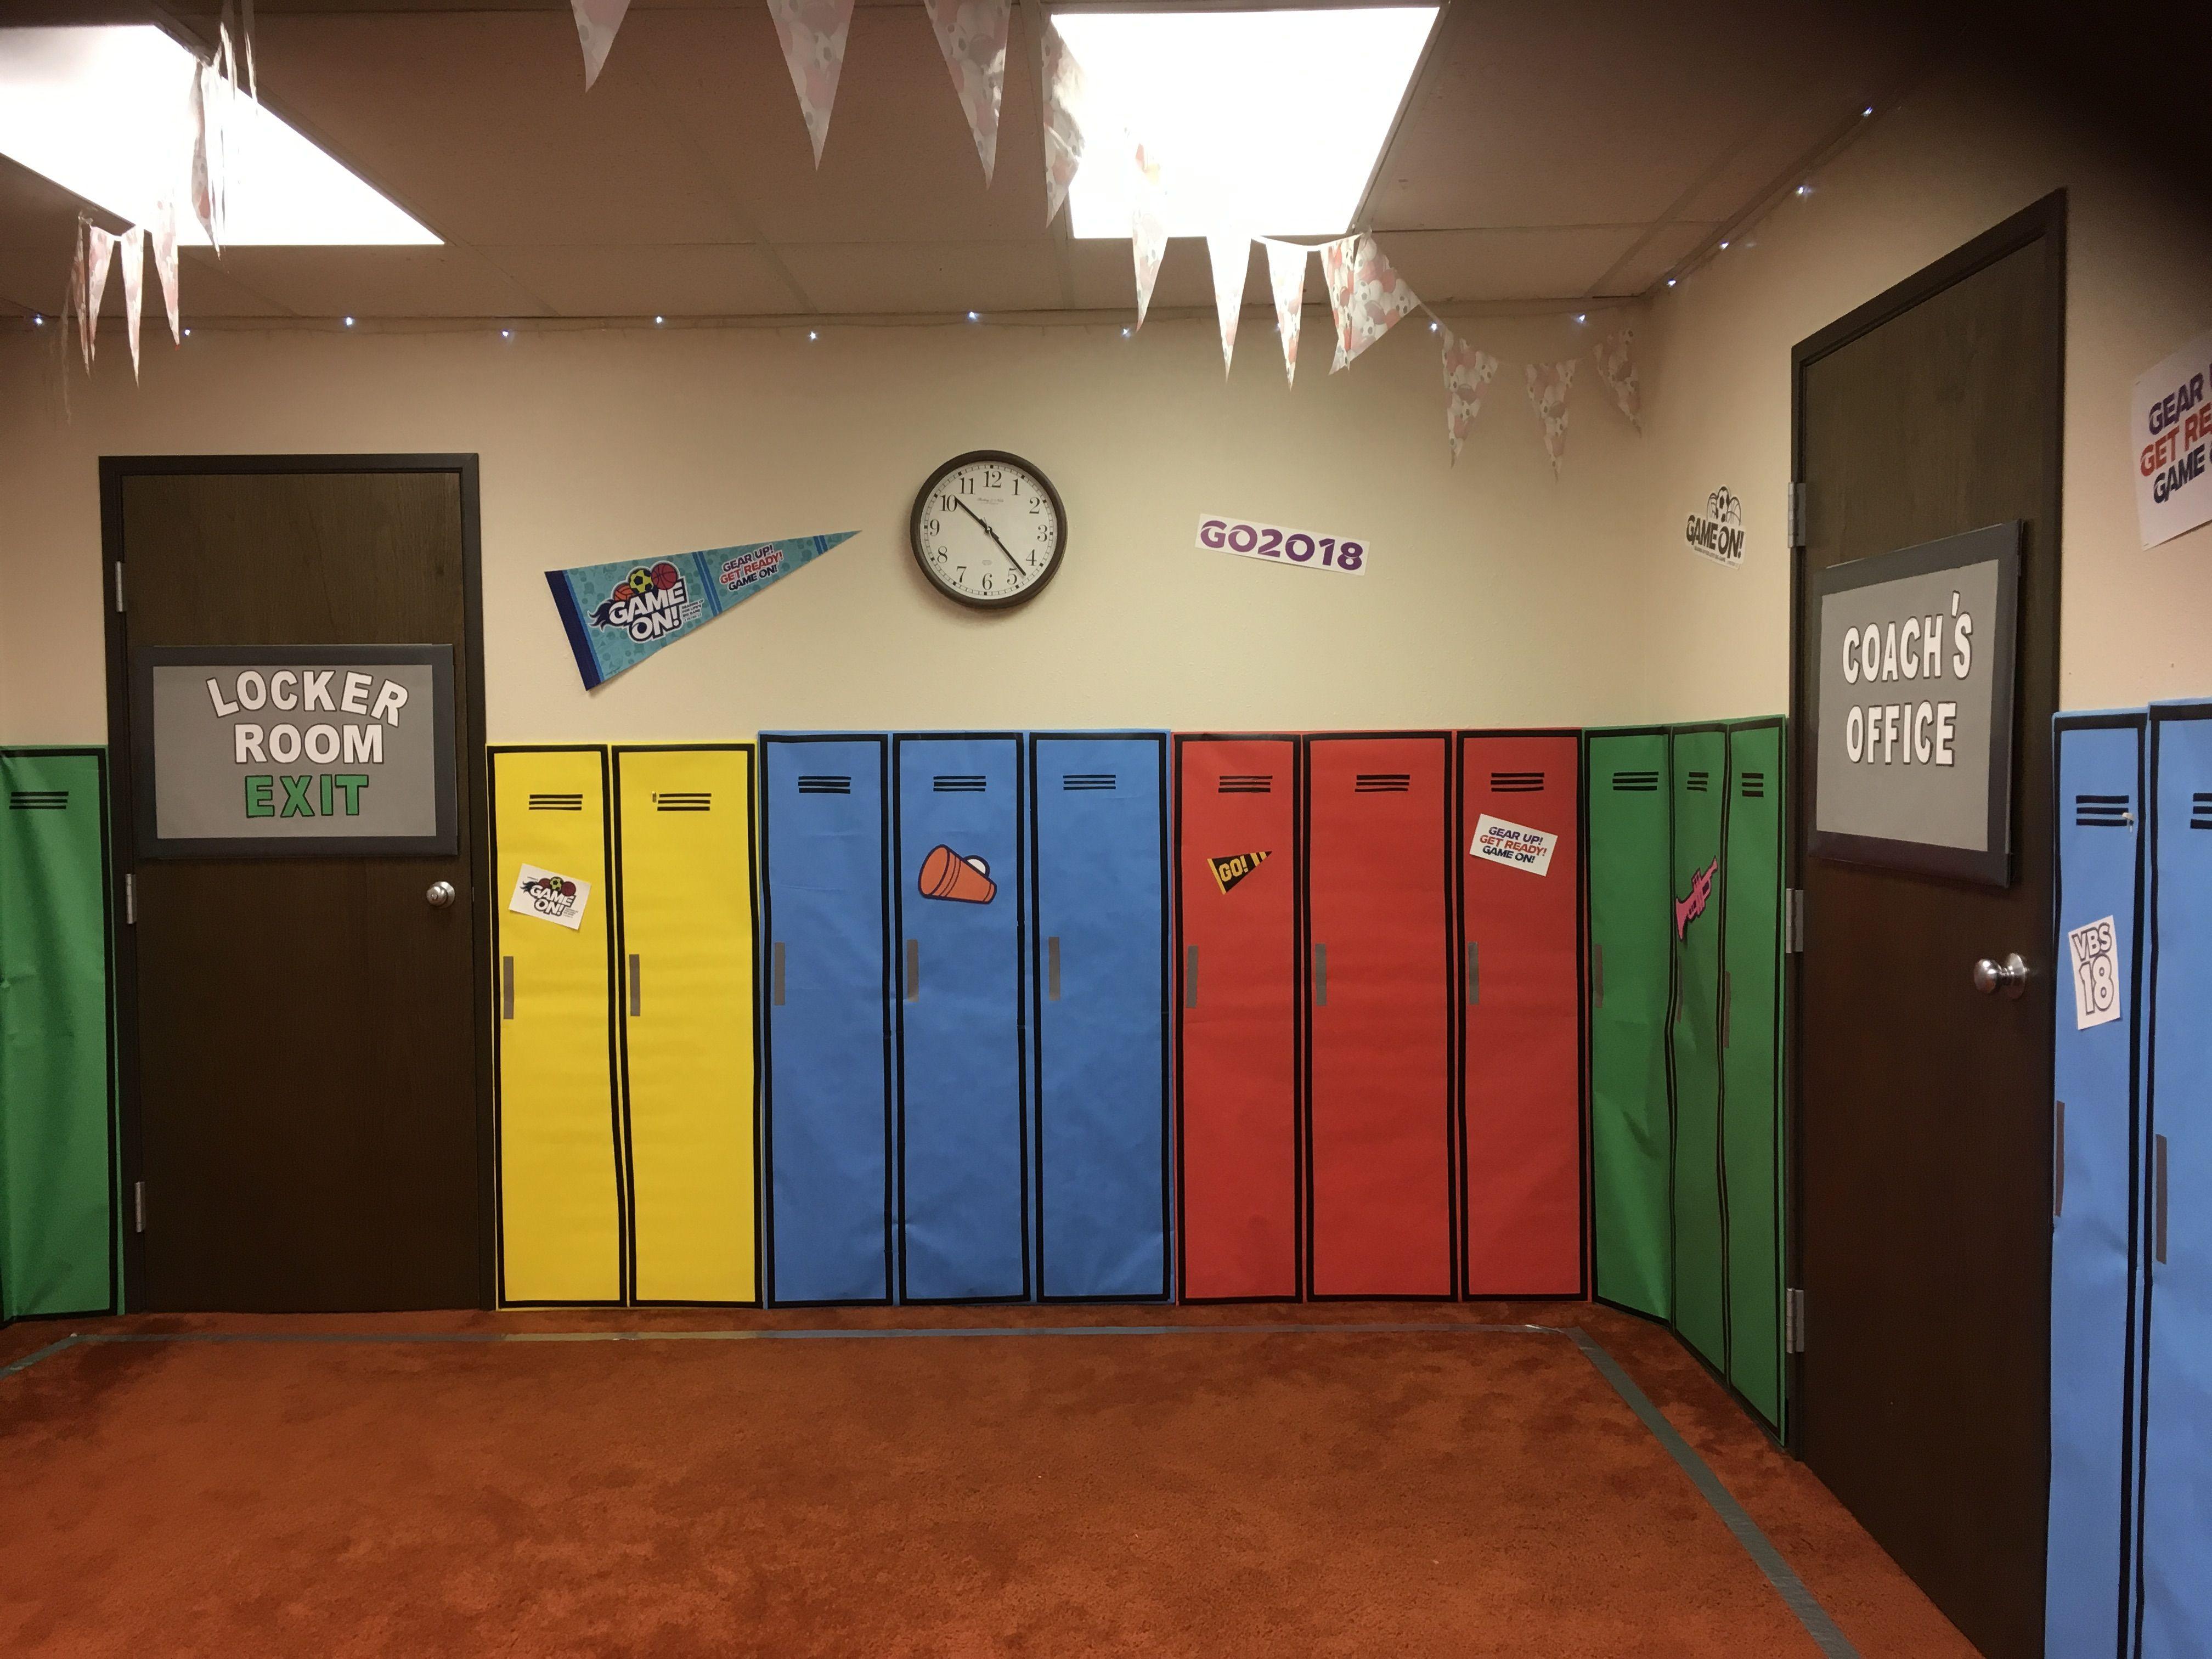 VBS Game On Locker Room | VBS 9 | Pinterest | Games, Sunday ...